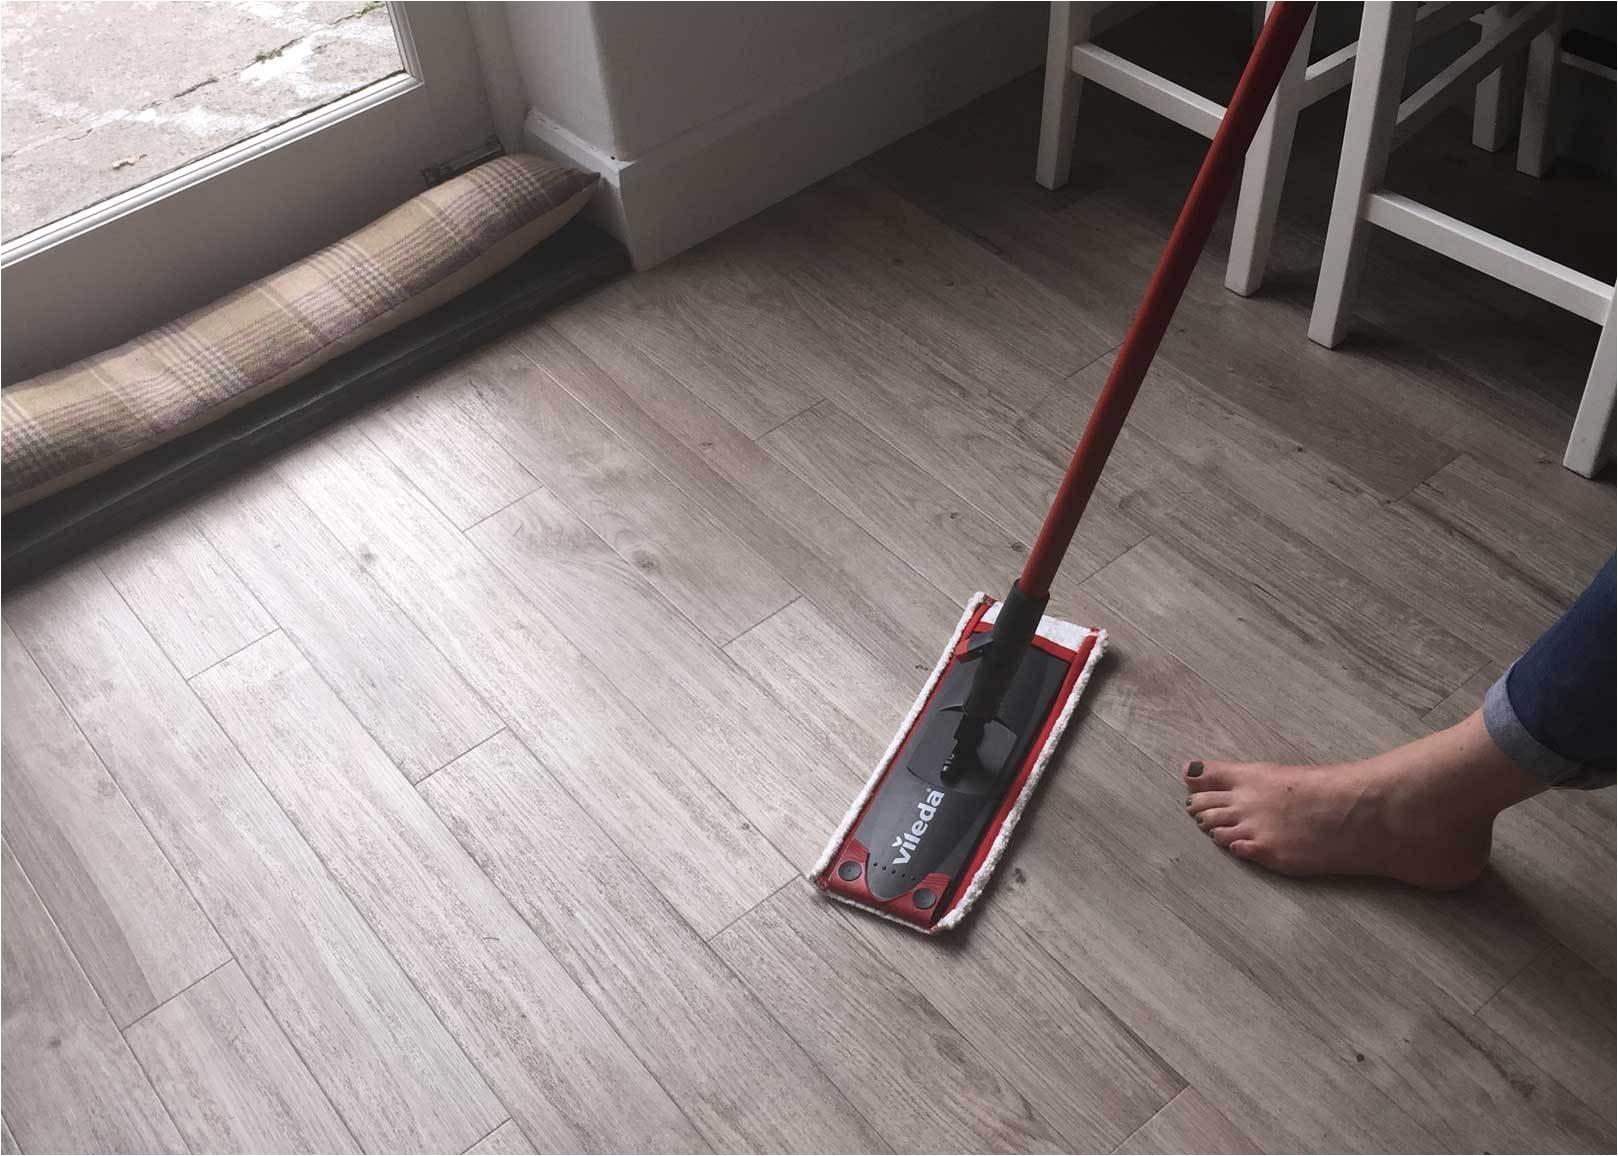 Best Way to Clean Hardwood Floors Steam Mop 20 Best Of Best Steam Mop for Wood Floors Accroalamode